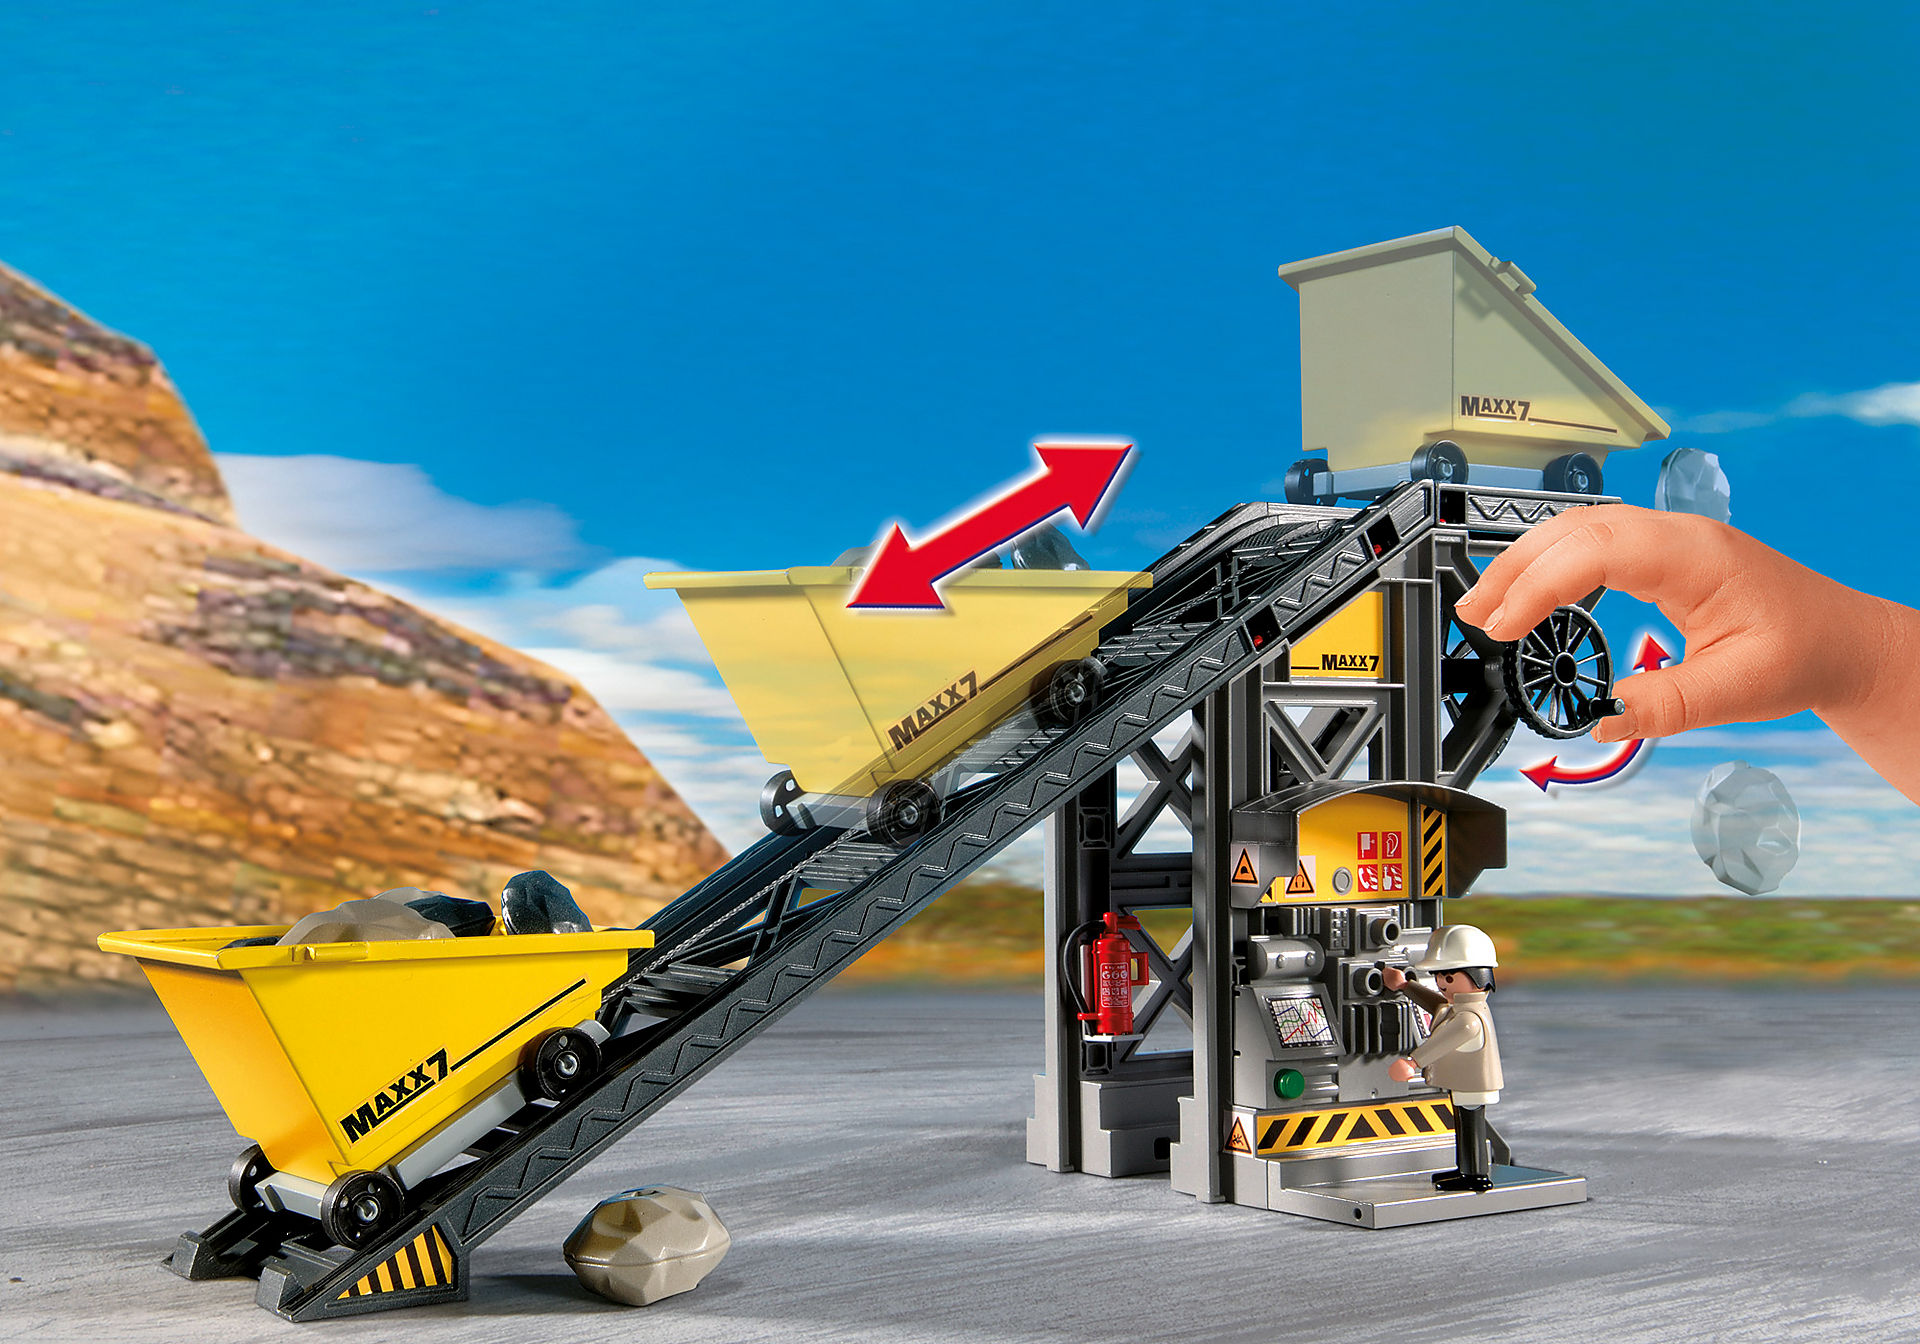 4041 Conveyor Belt with Mini Excavator zoom image4